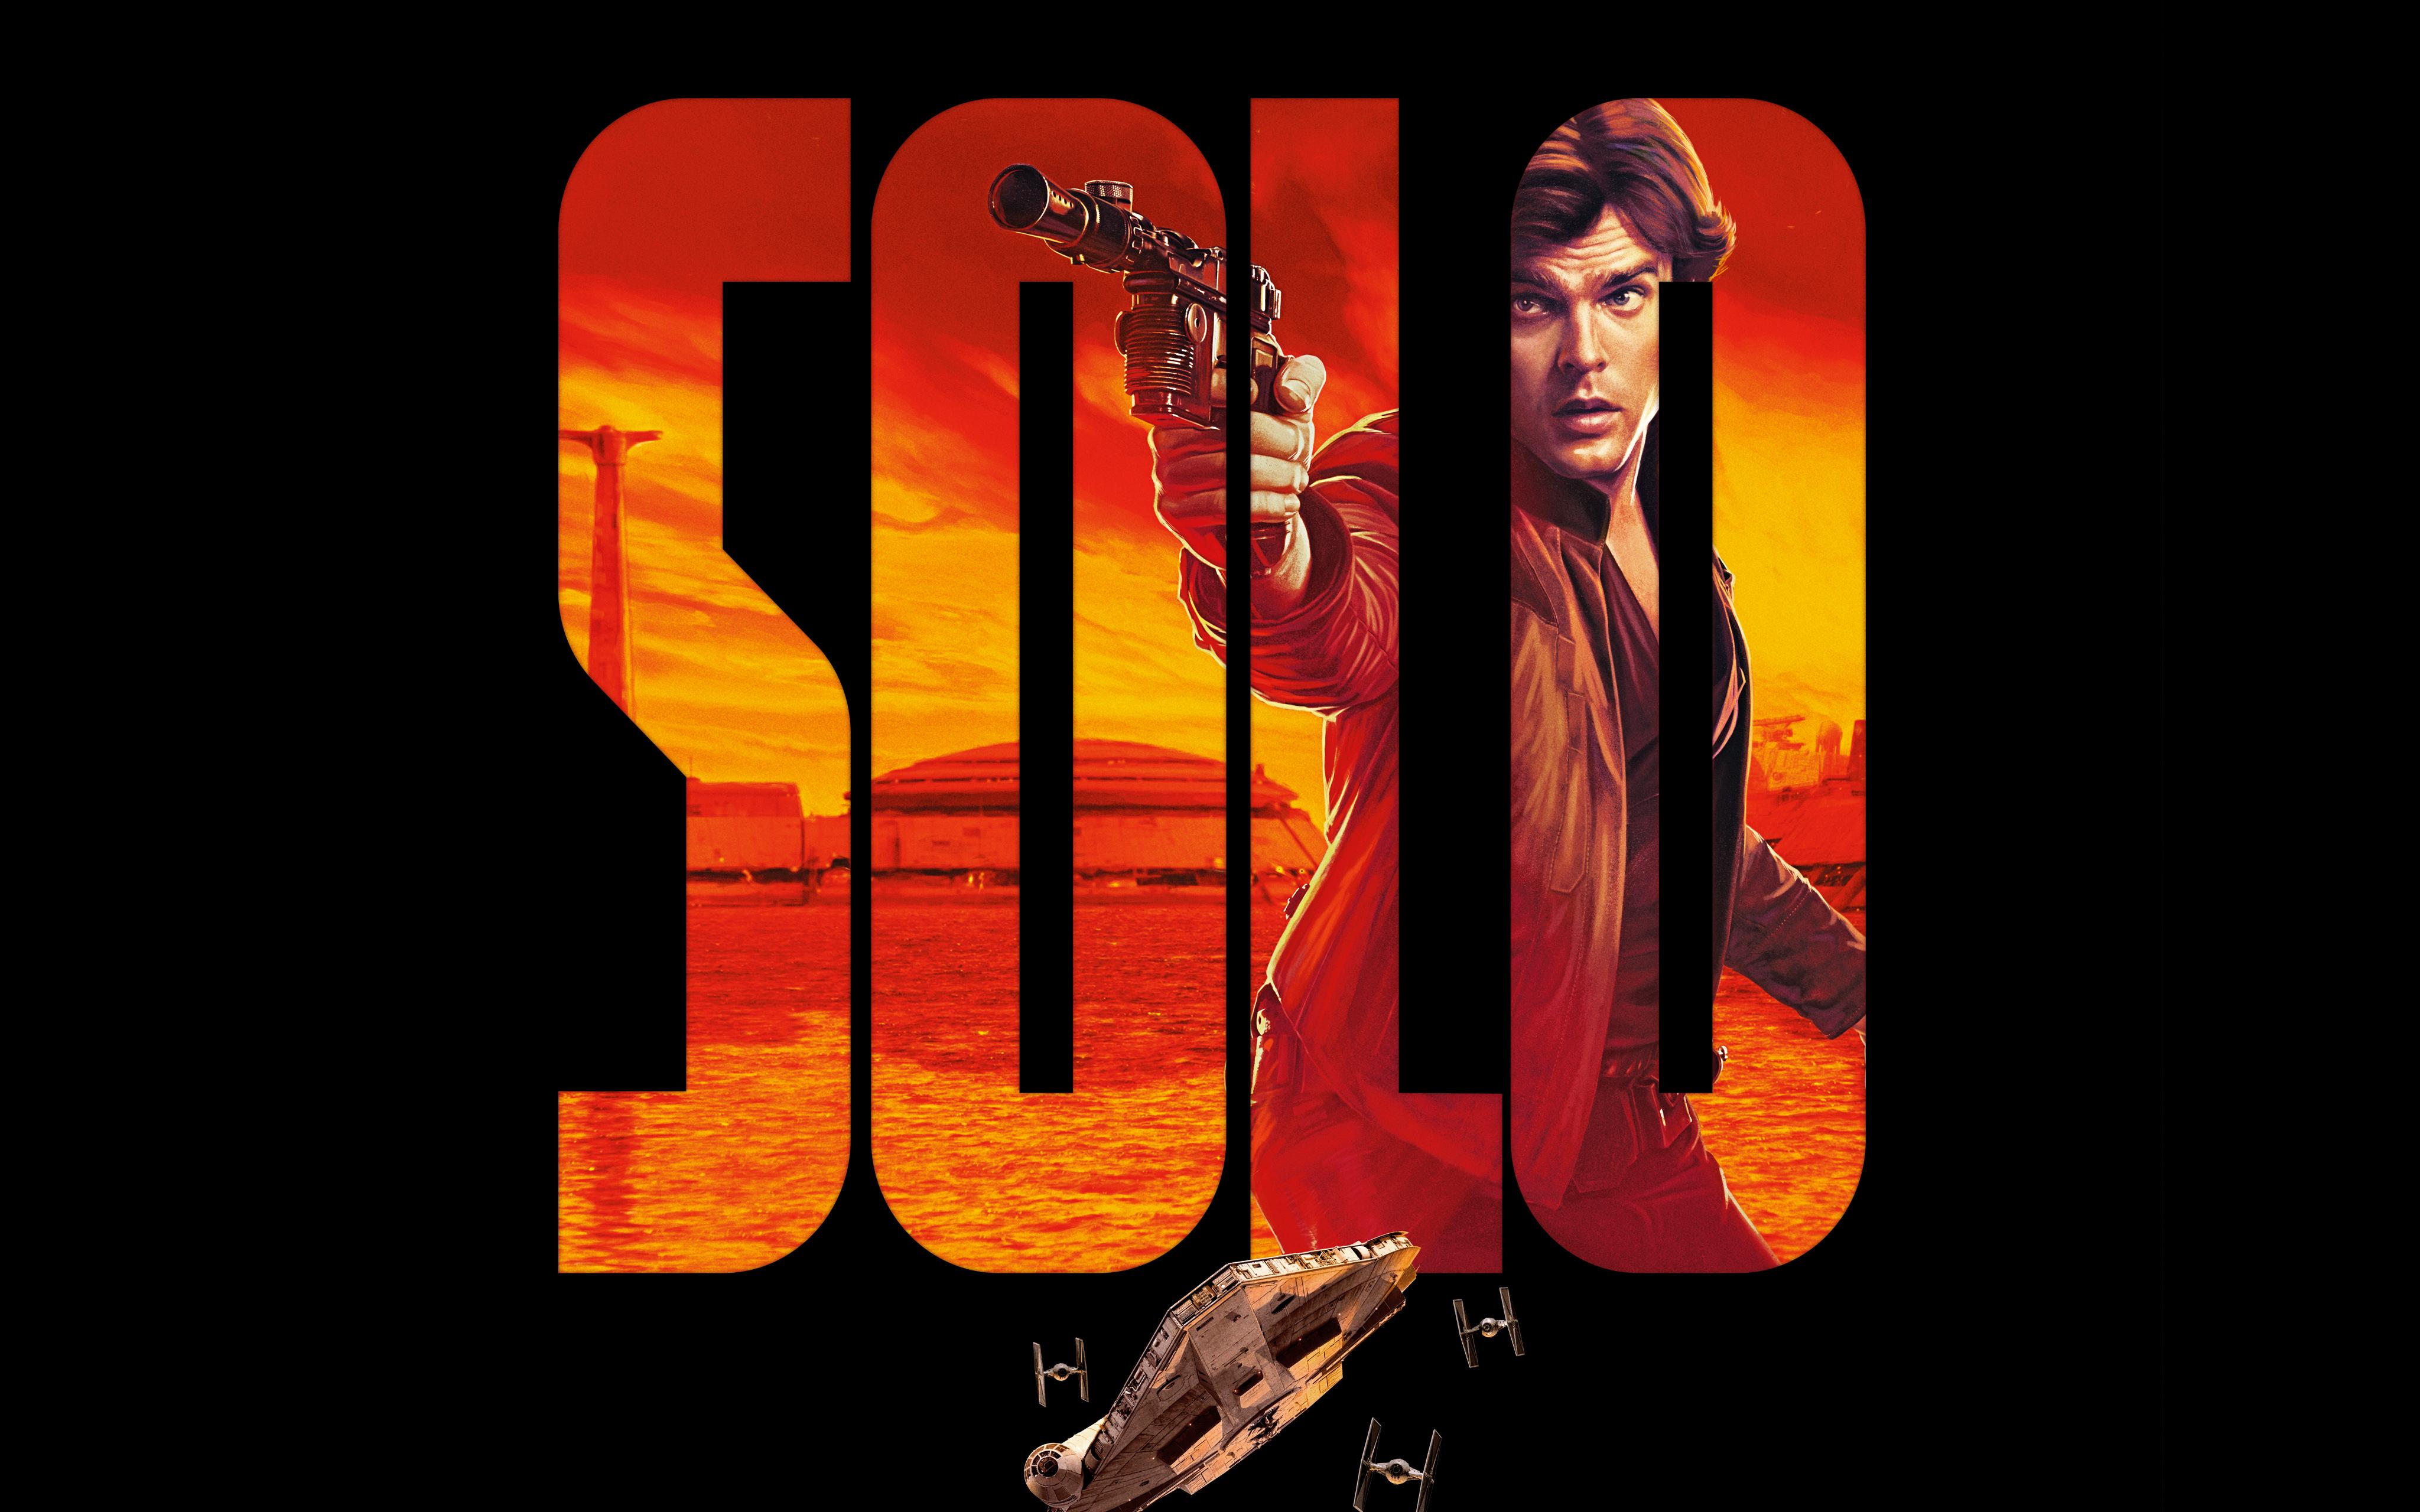 Solo Star Wars Background 4096x2560 Download Hd Wallpaper Wallpapertip